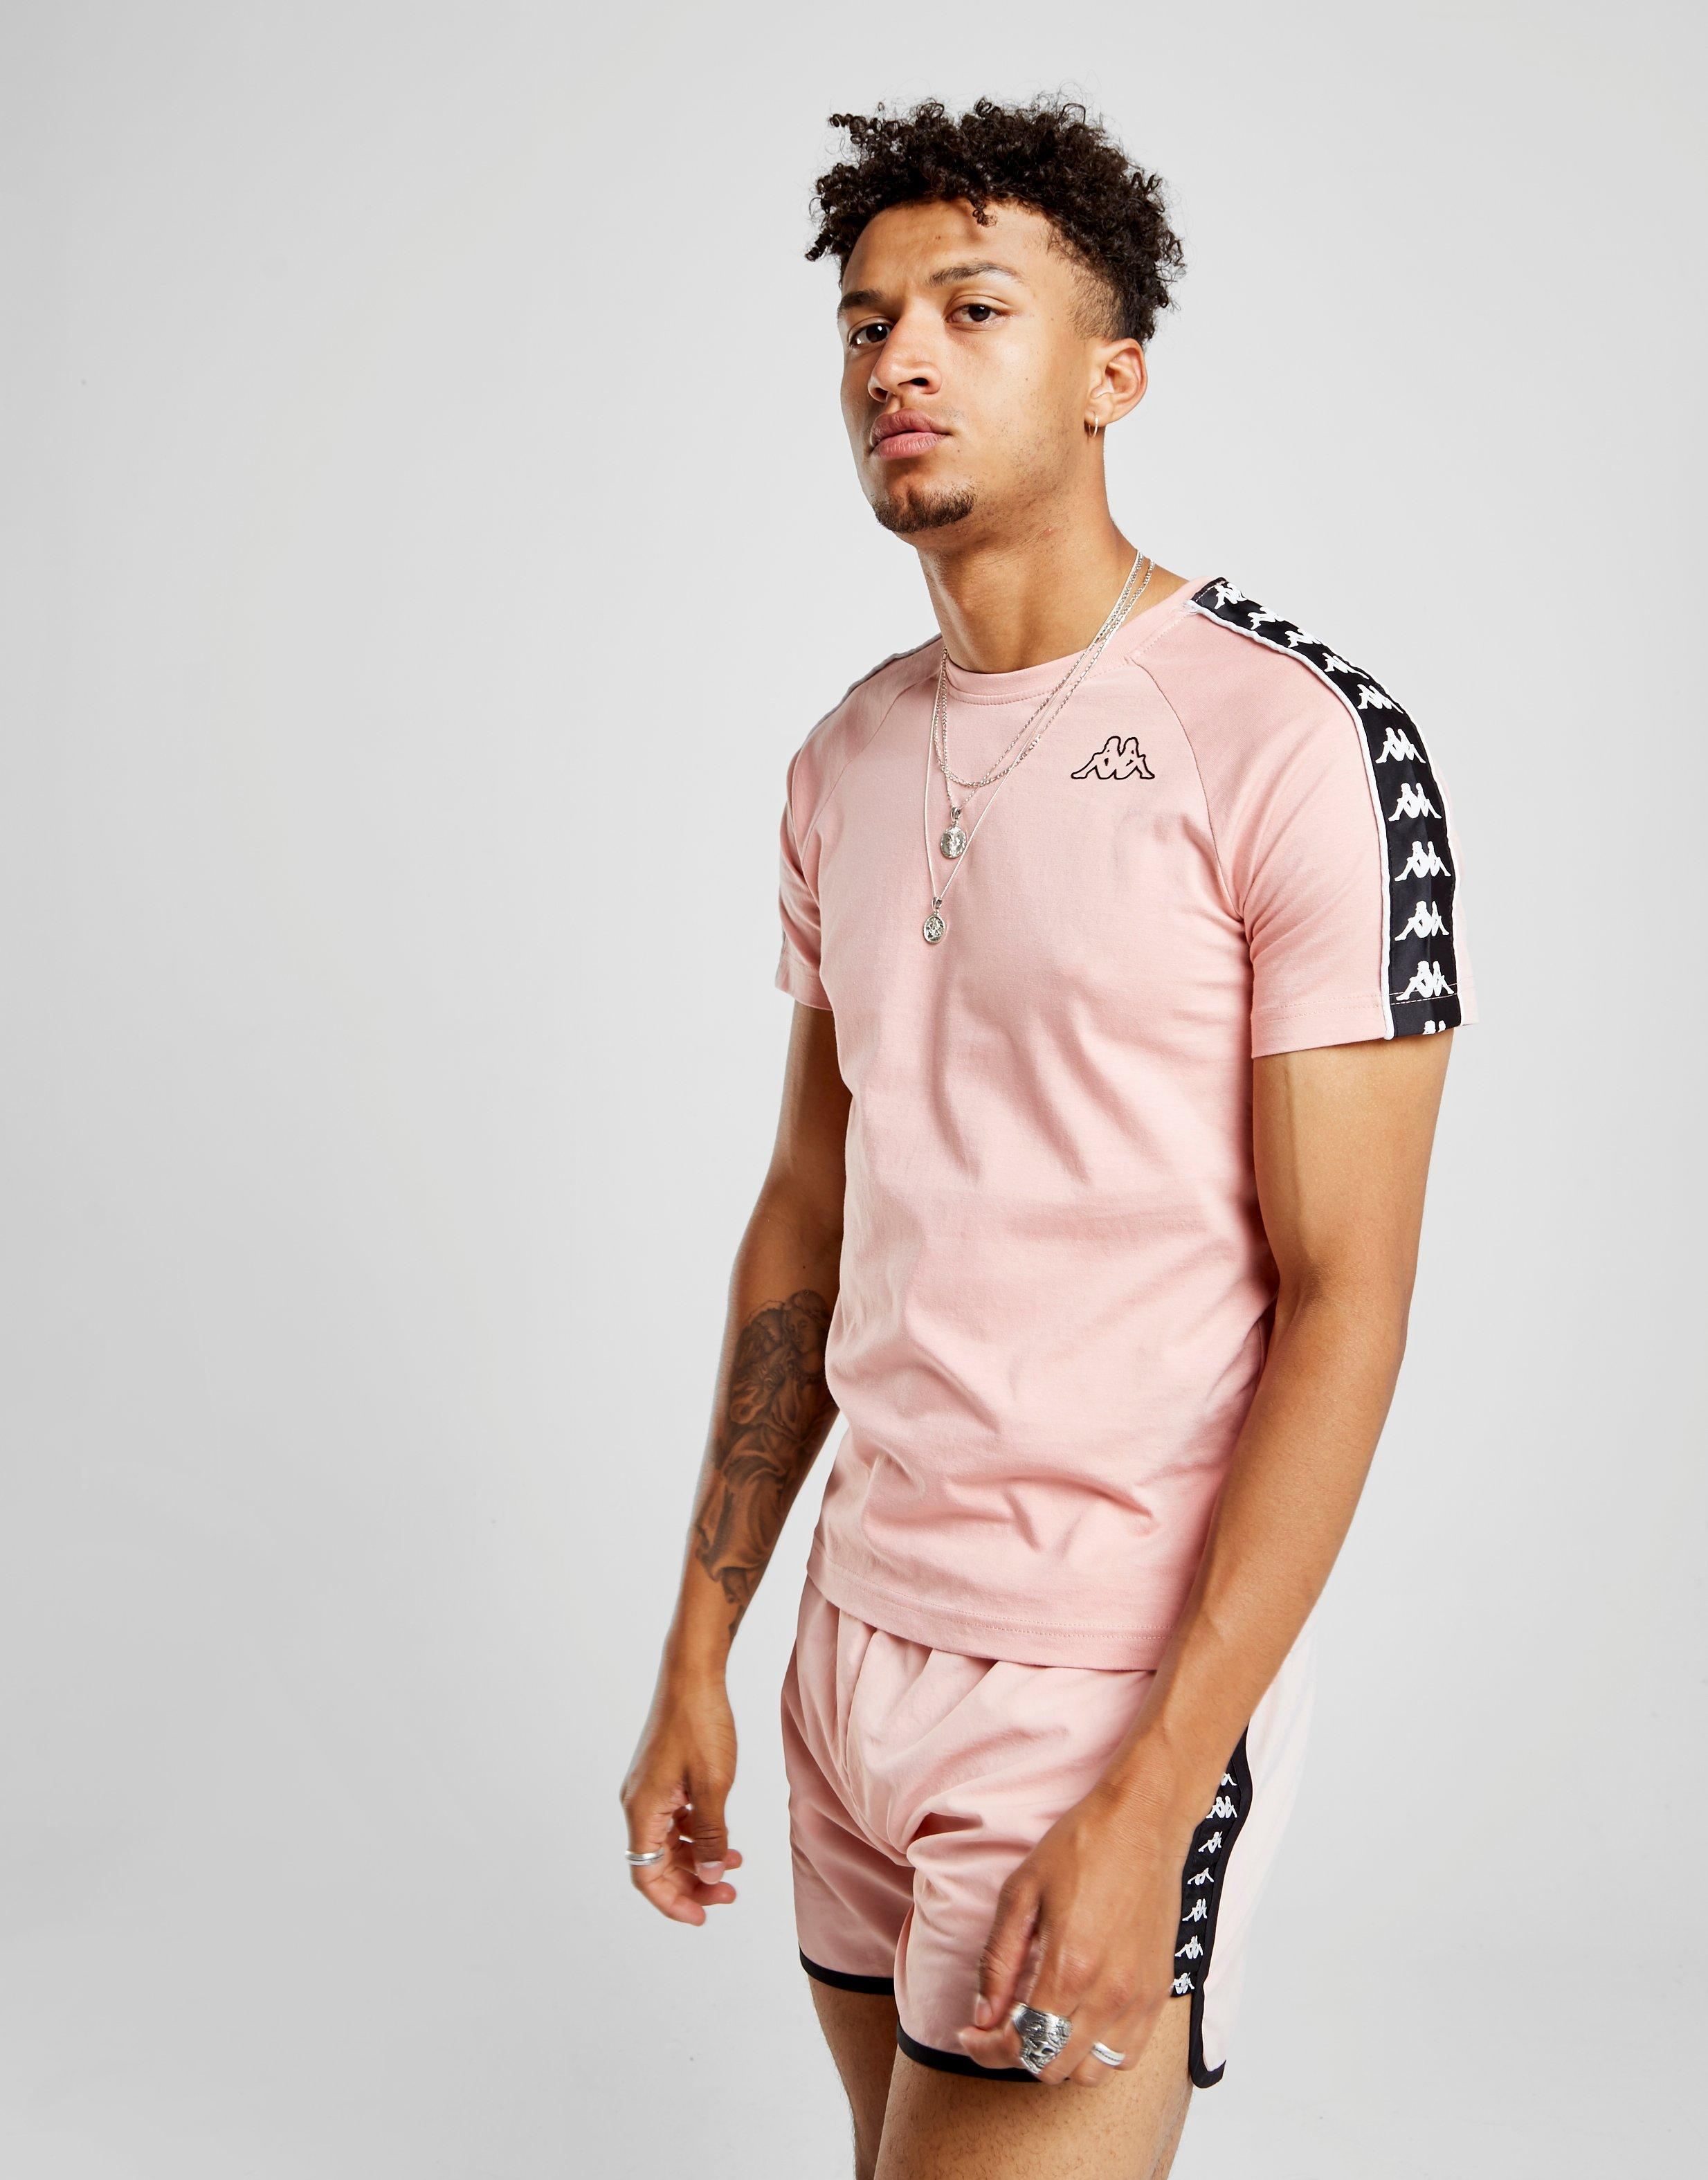 Sleeve Coen For Pink Shirt Lyst In Men Short Kappa T SVqUMpz